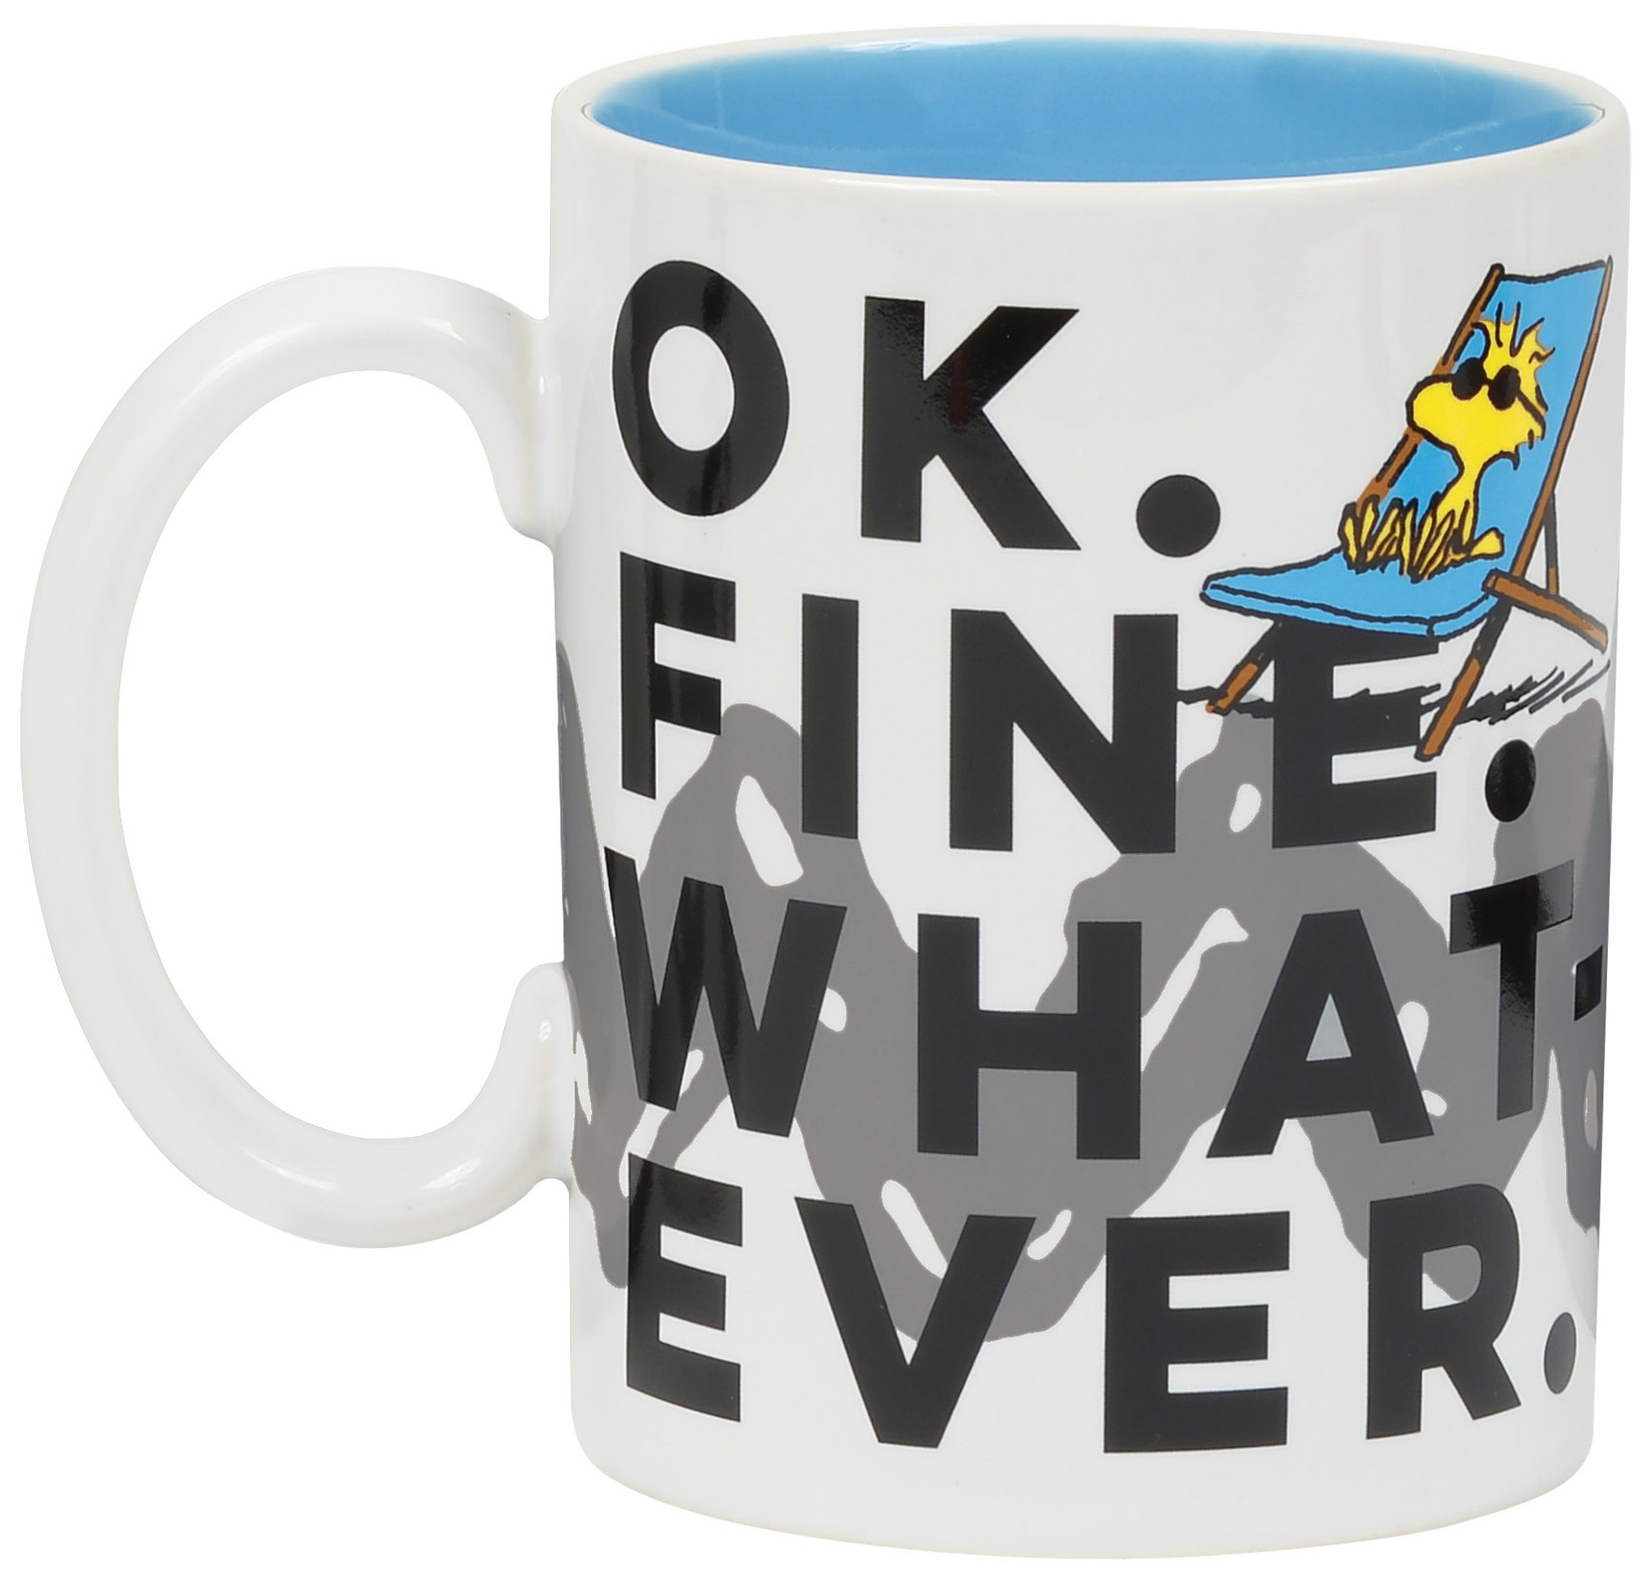 Peanuts by Department 56 6002589 Ok Fine Whatever Mug